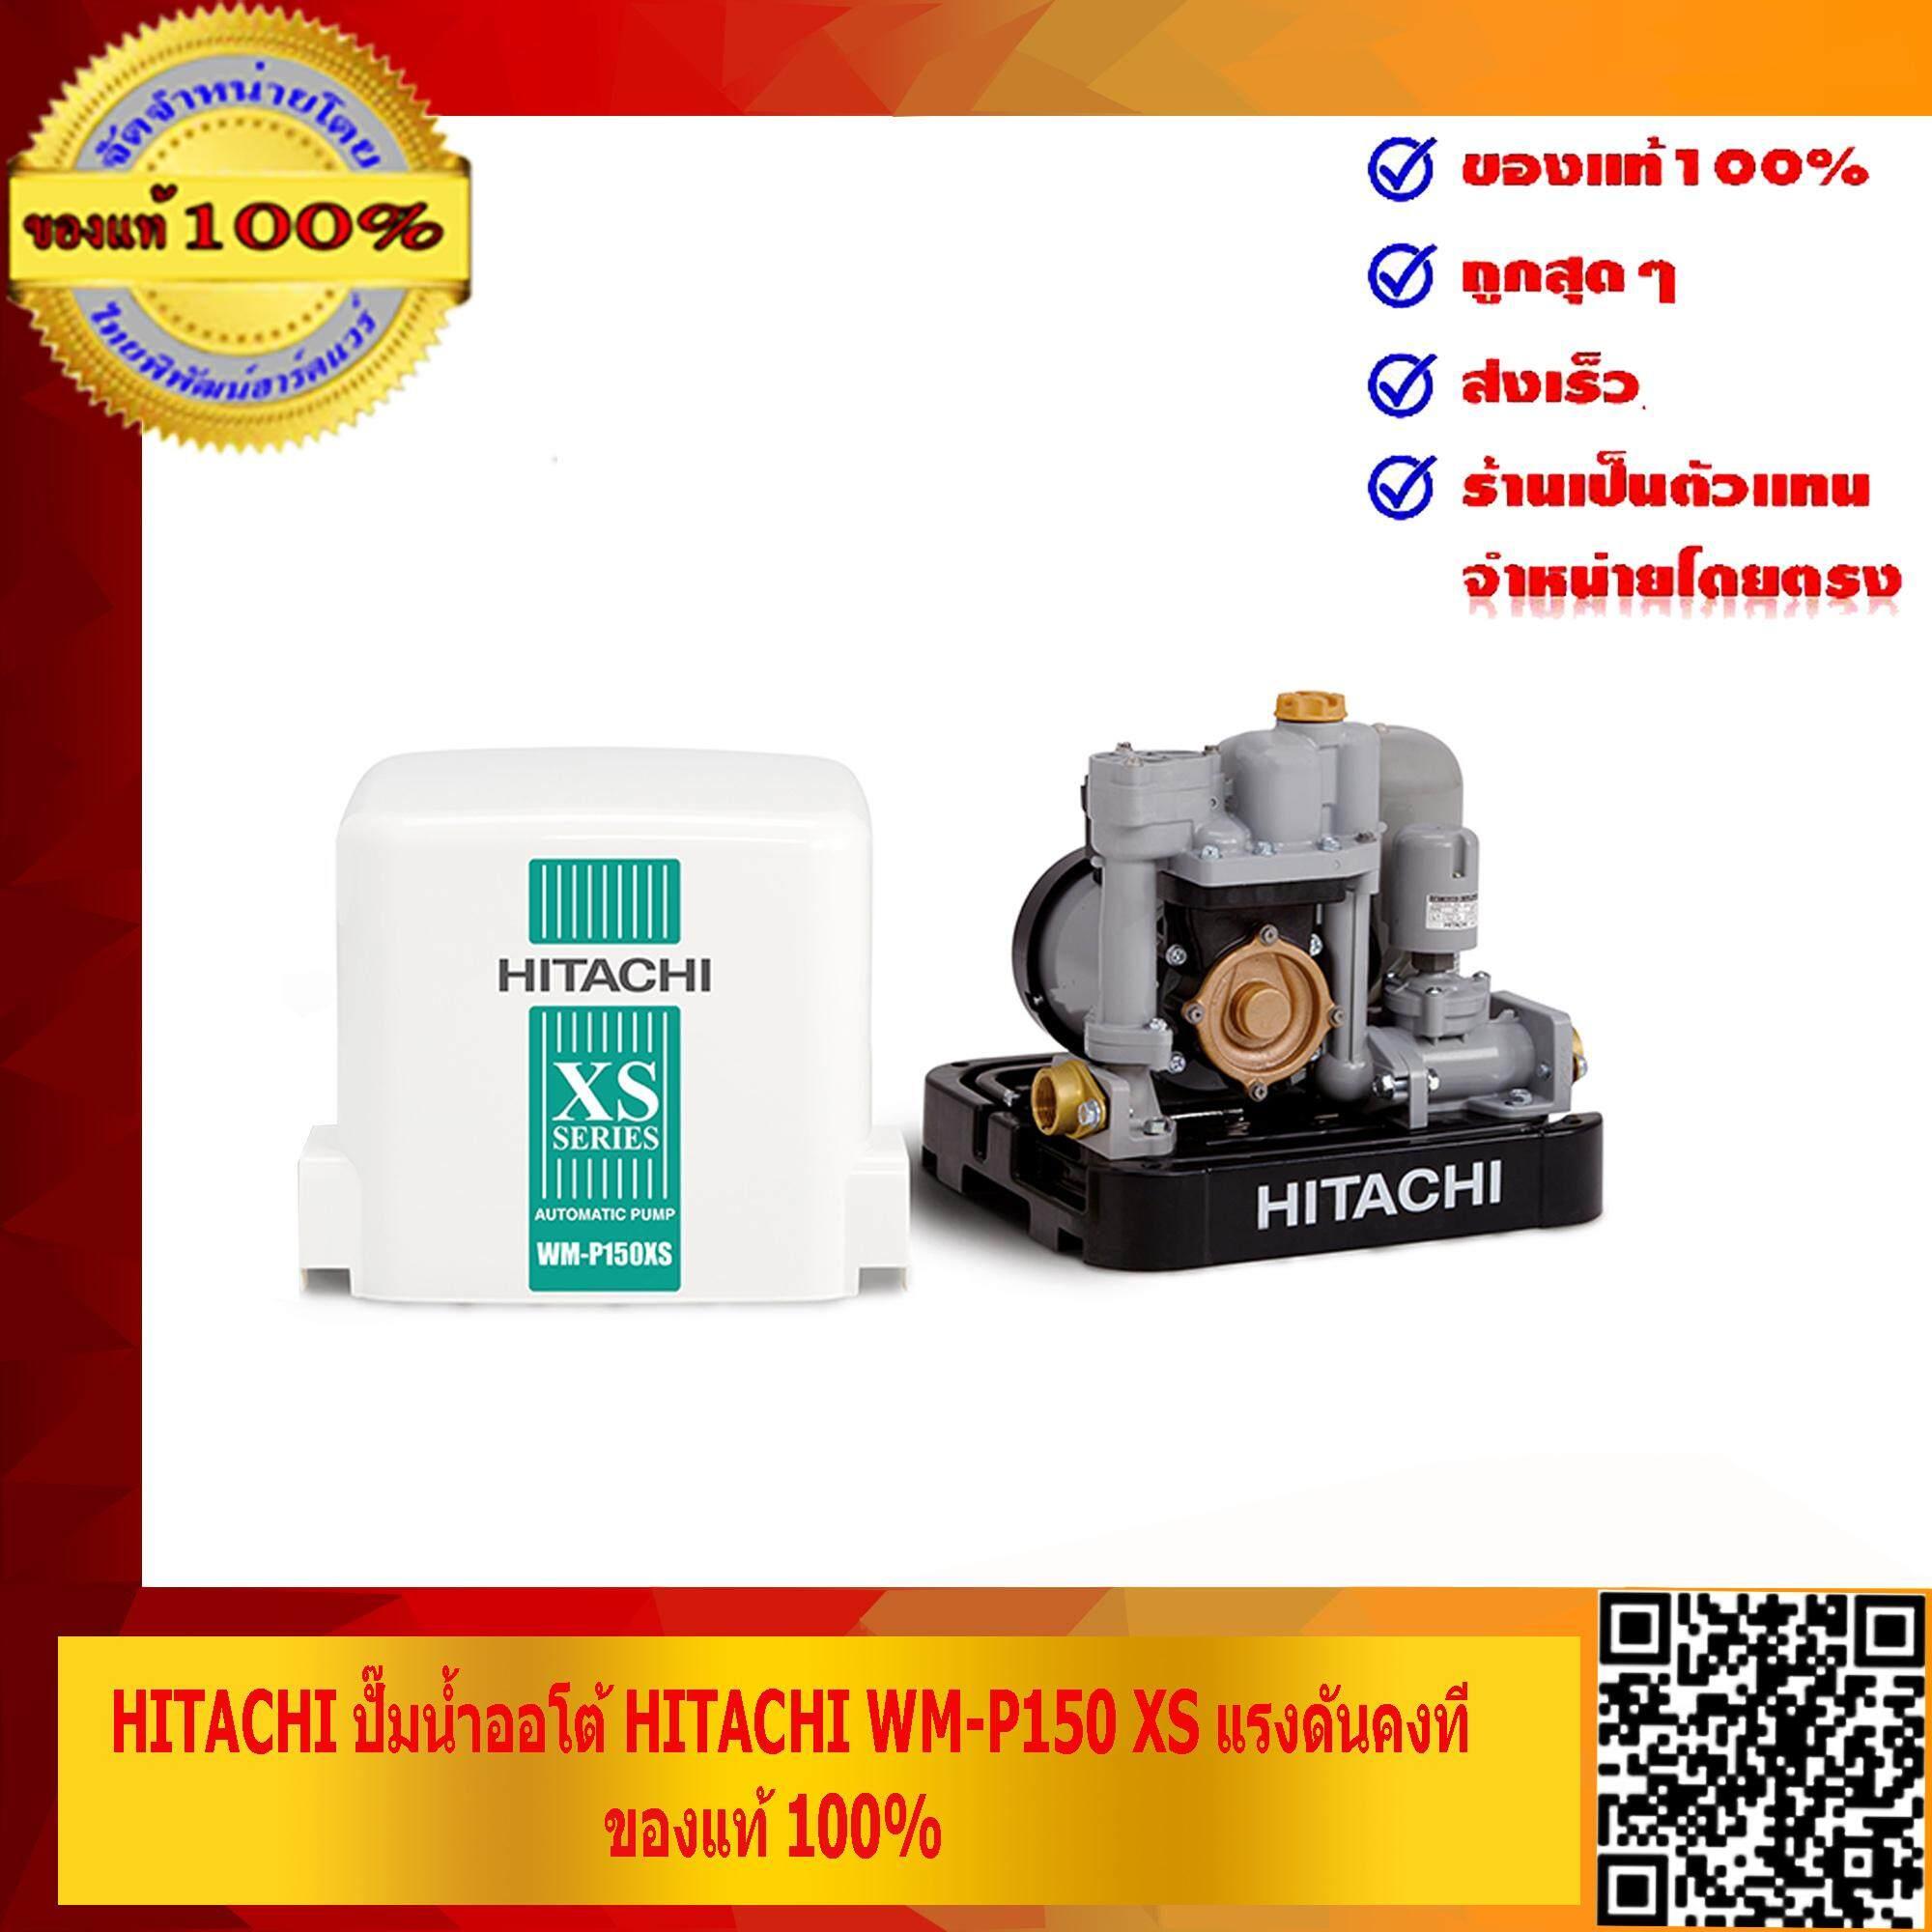 HITACHI  ปั๊มน้ำออโต้ HITACHI WM-P150 XS แรงดันคงที่ ของแท้ 100% ส่งฟรี KERRY